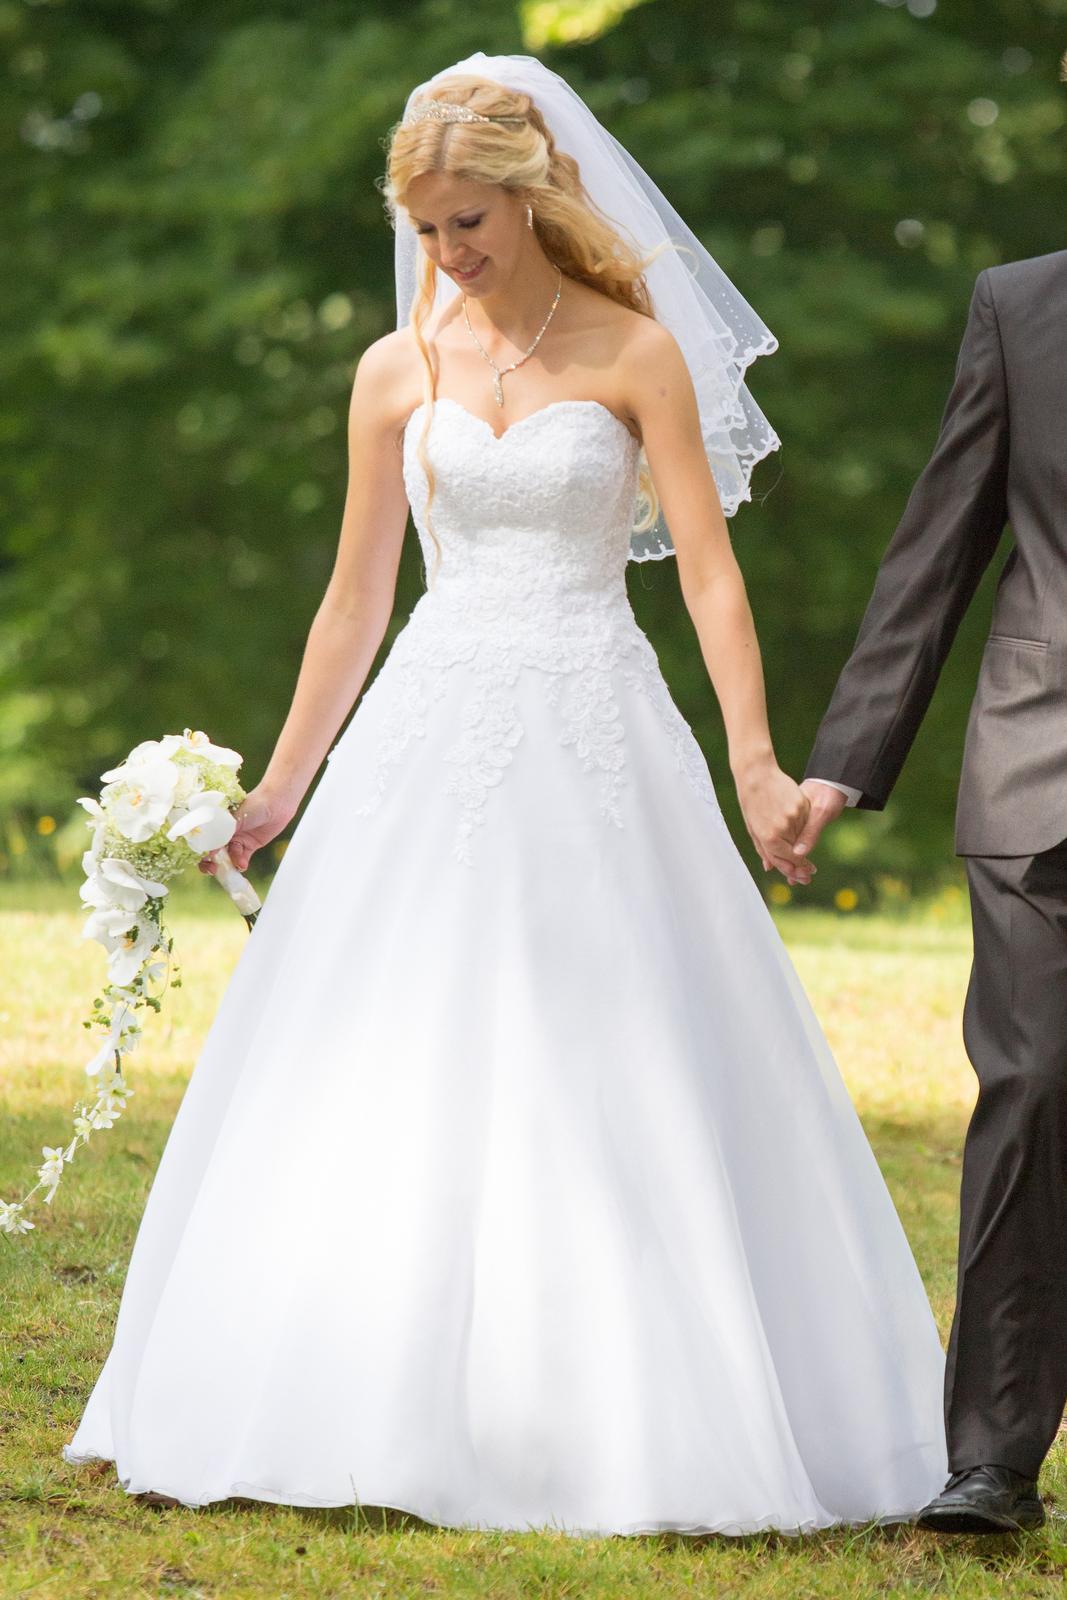 Korzetove Saty Agnes Bridal Dream M L 175cm 38 9 000 Kc